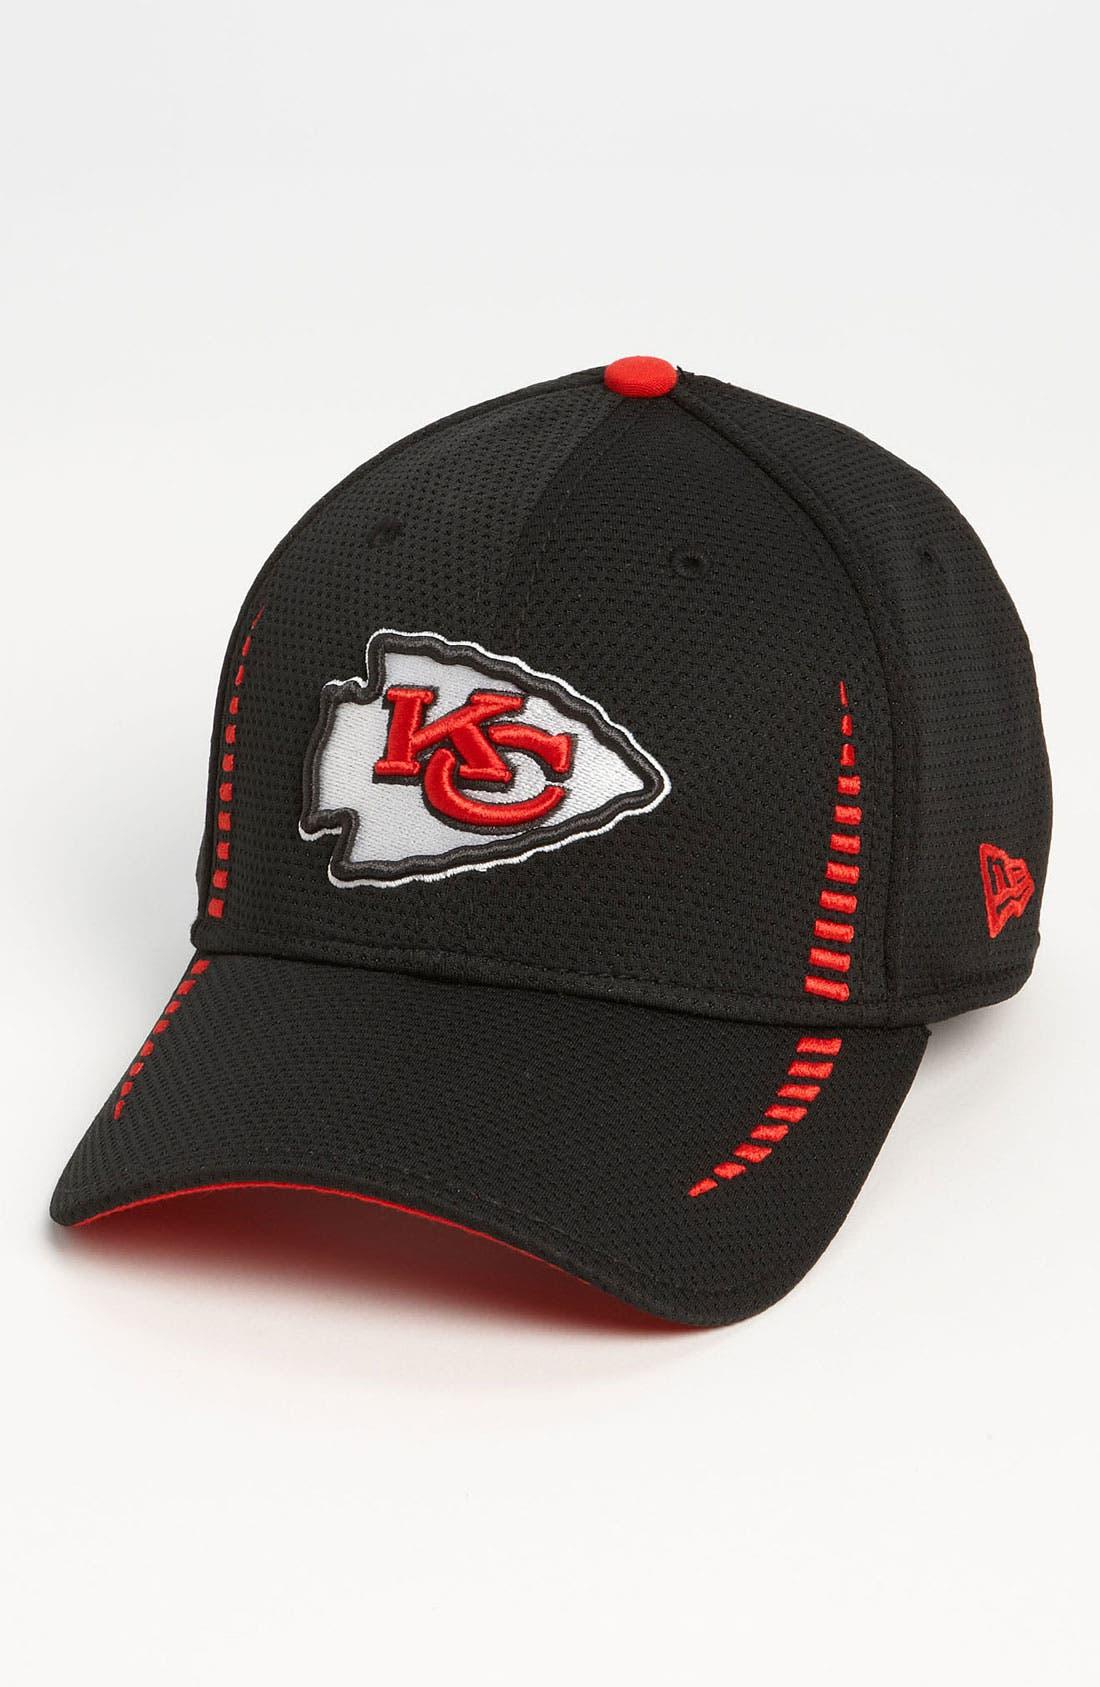 Main Image - New Era Cap 'Training Camp - Kansas City Chiefs' Baseball Cap